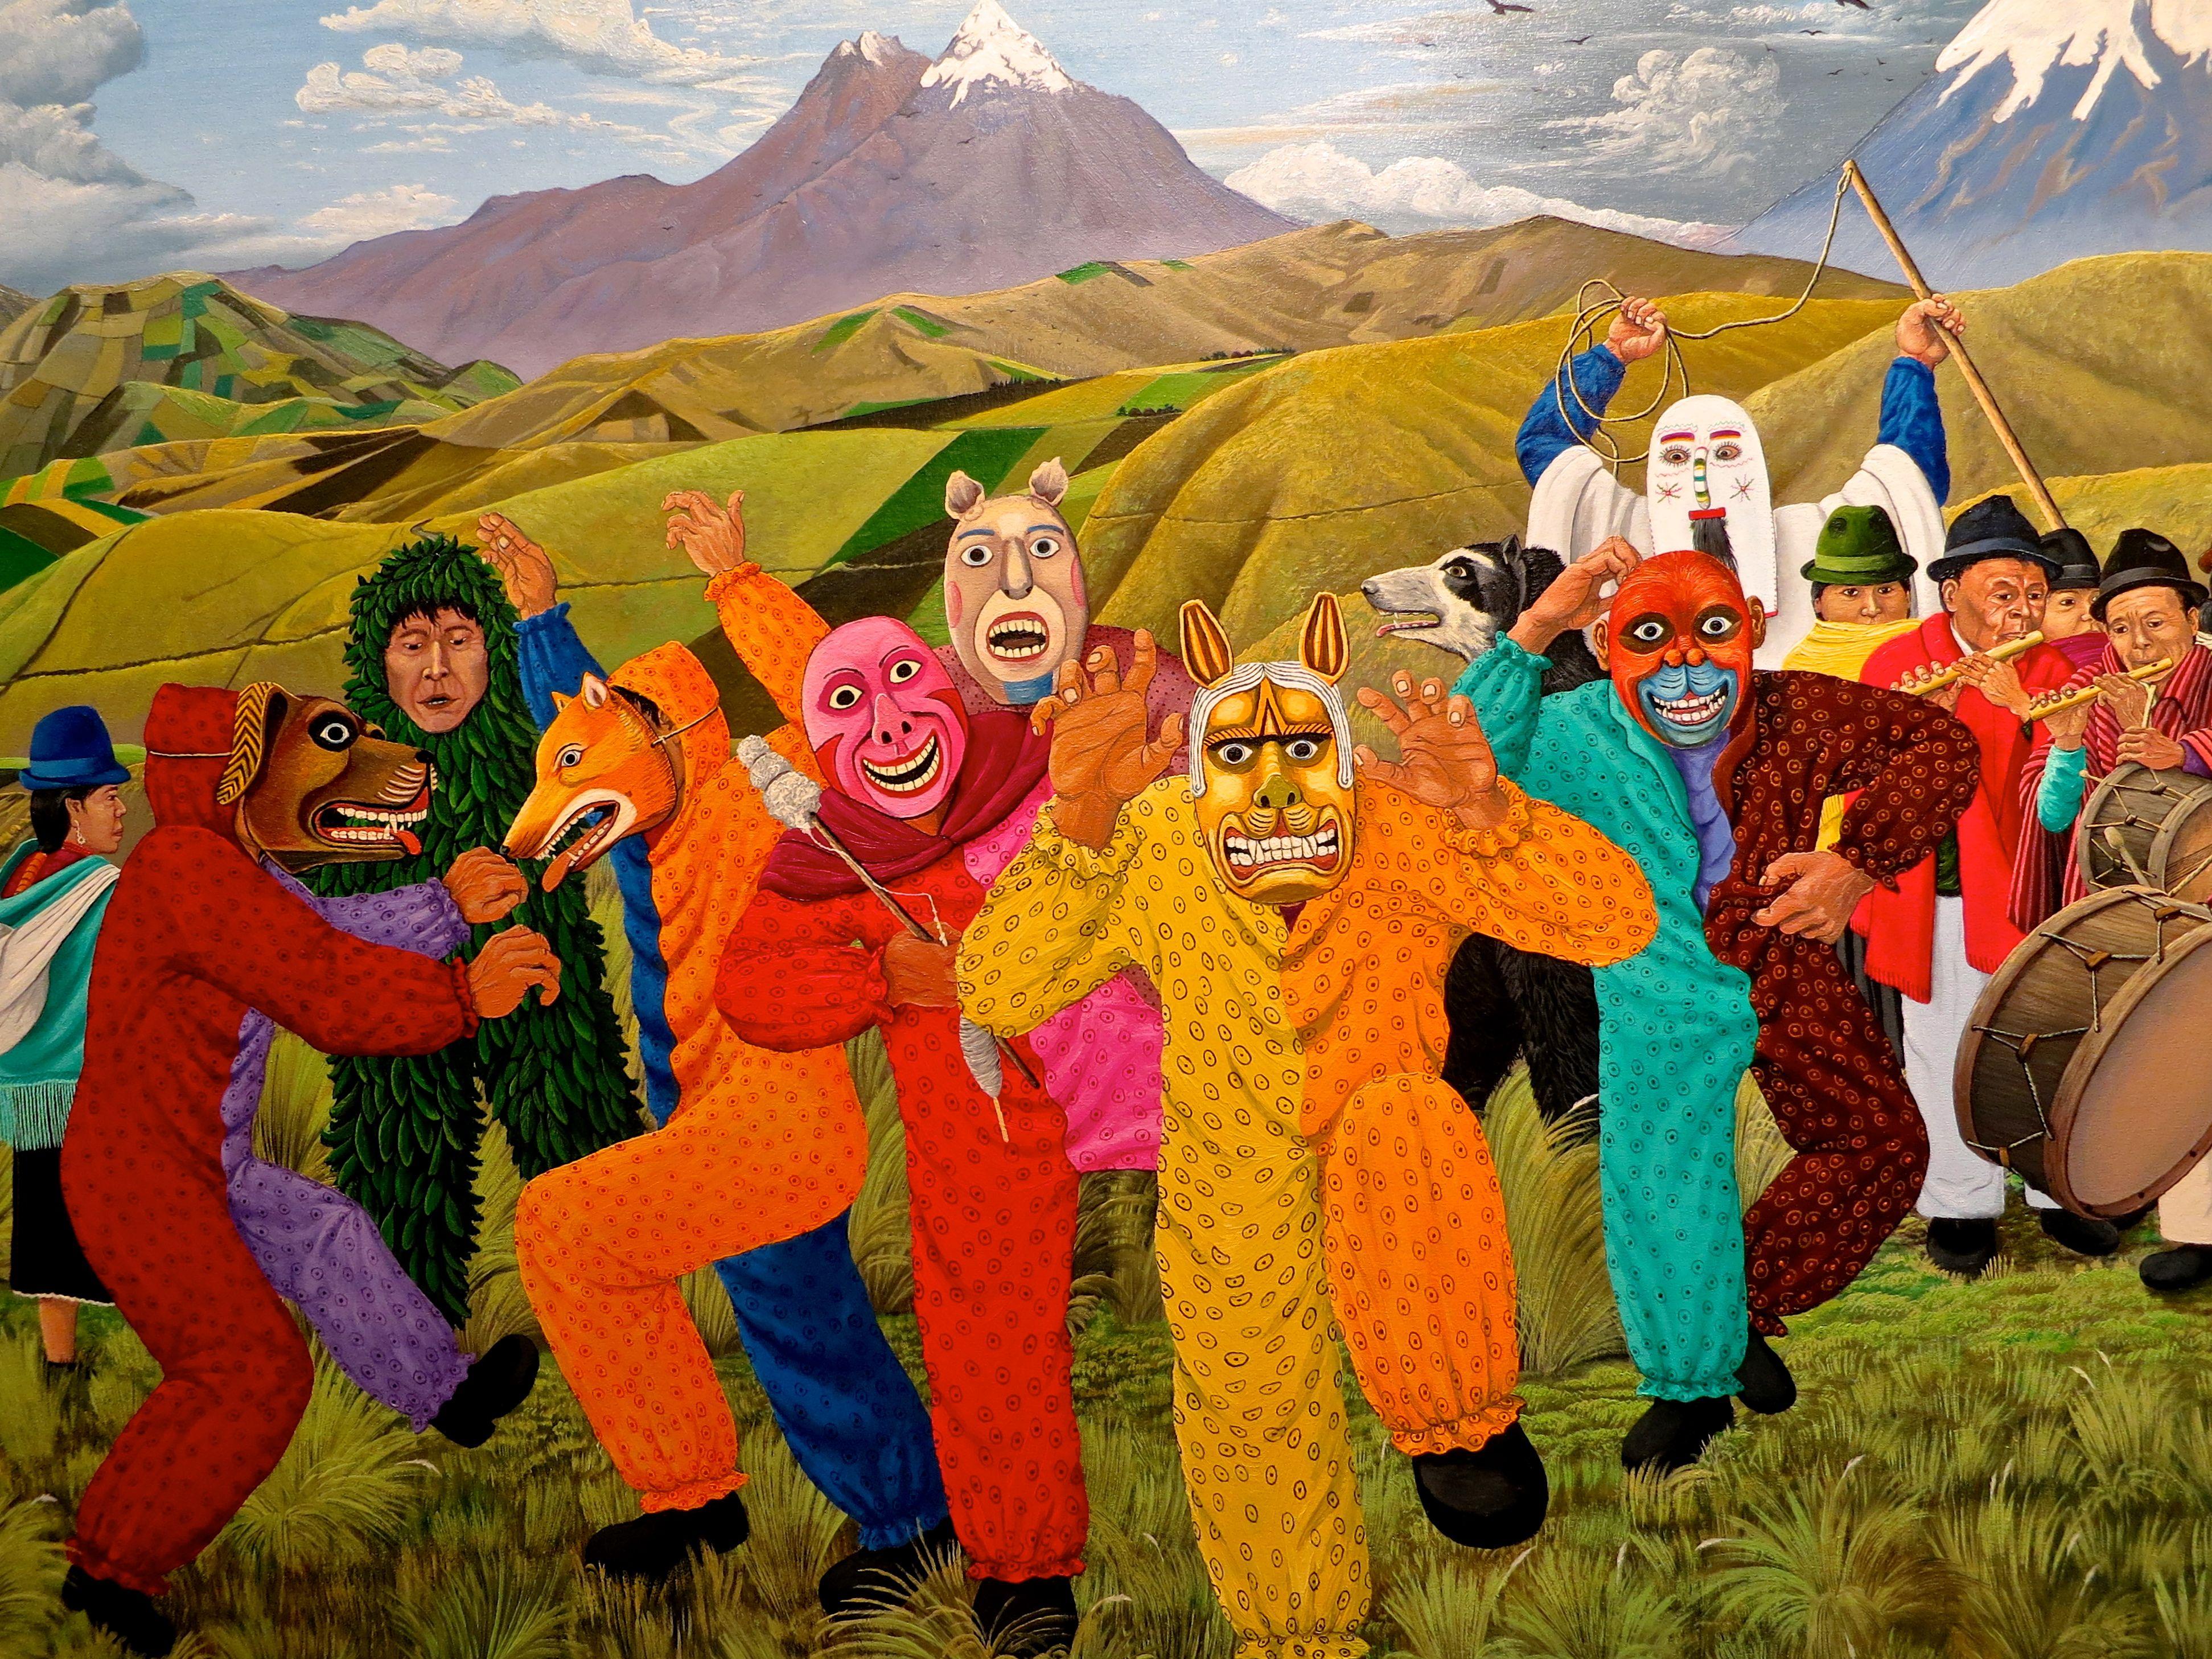 TIGUA PAINTING | Art, Folk art, Painting